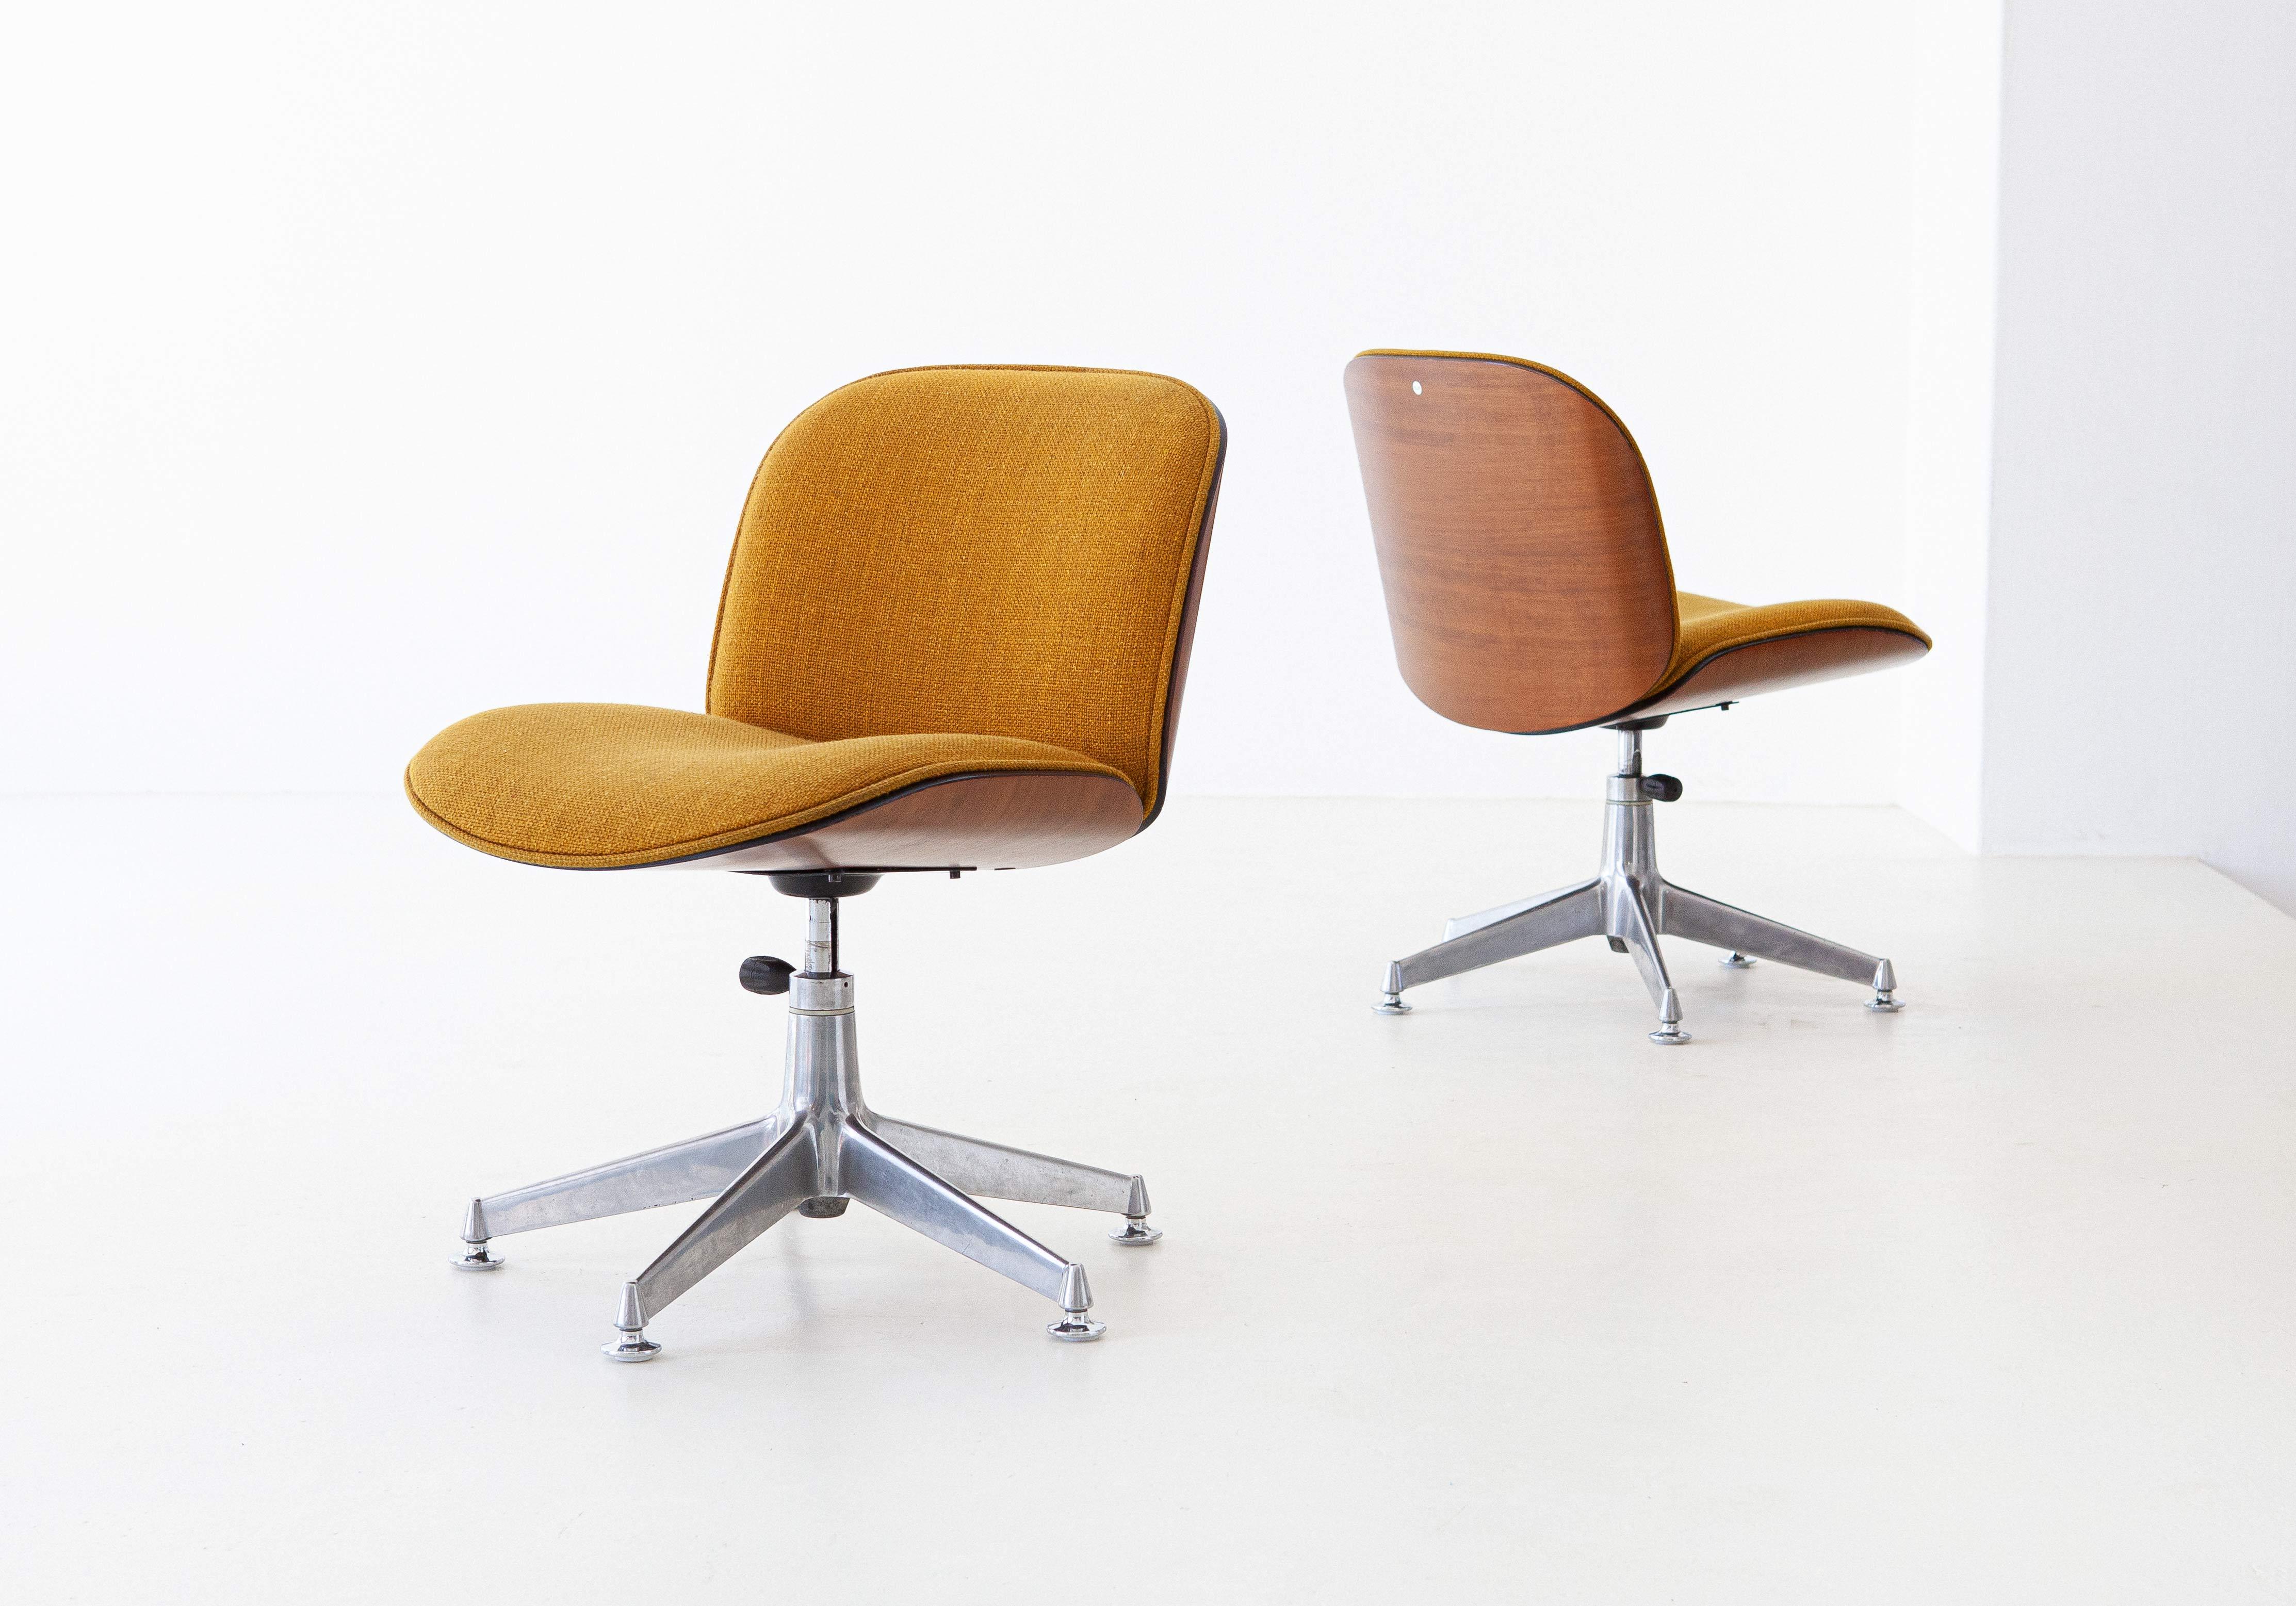 1950s-ico-parisi-for-mim-walnut-swivel-desk-chairs-1-se305